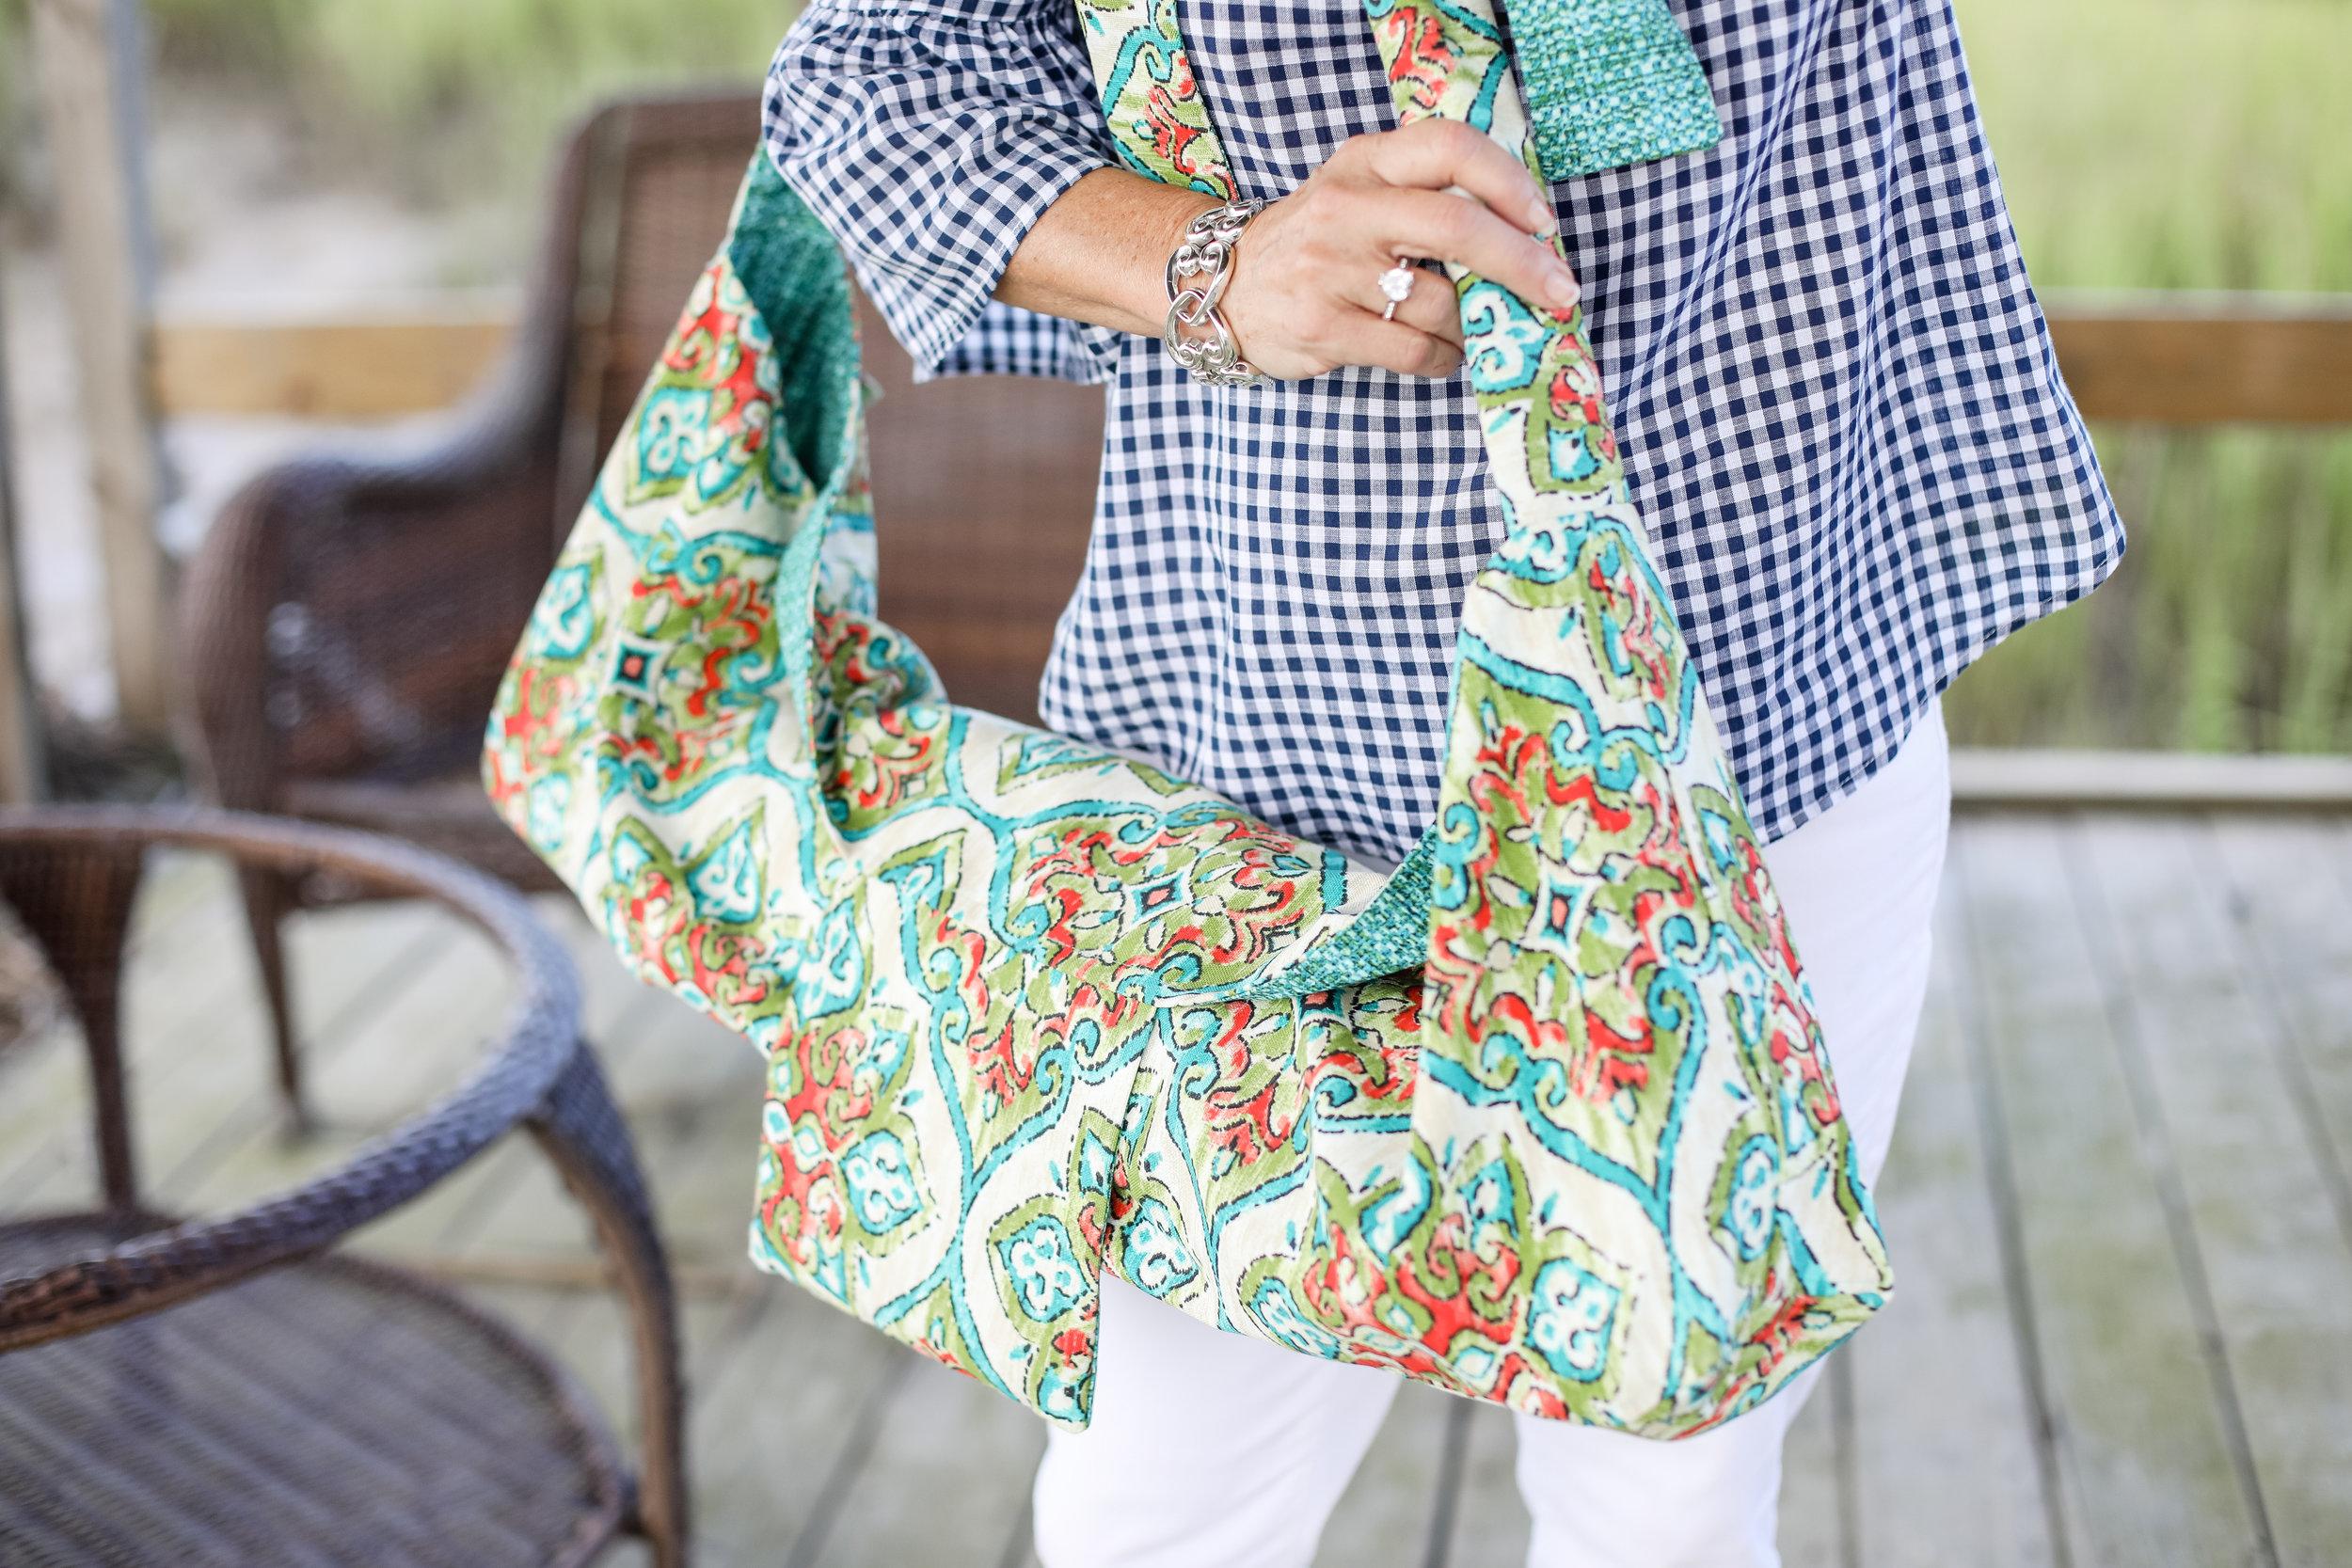 Yoga Mat Bag Bartique Designs St. Simons Island, GA Omcore Yoga Brunswick Photographer